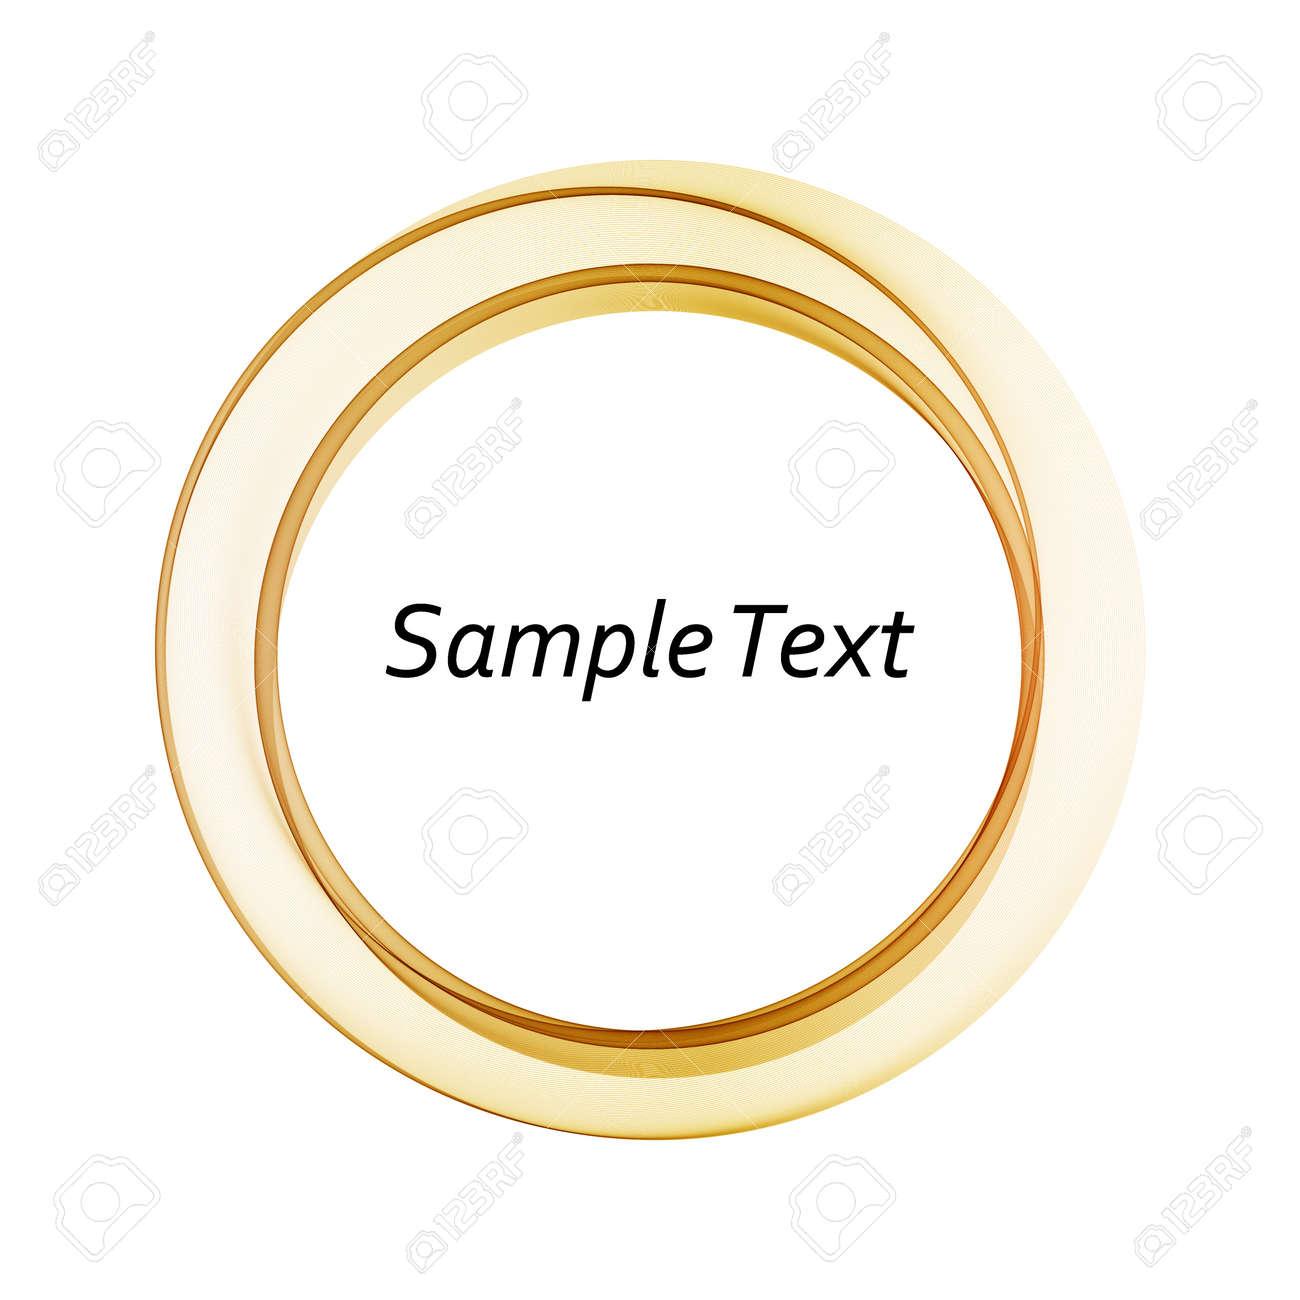 Wavy round gold frame, on white background - 165552985